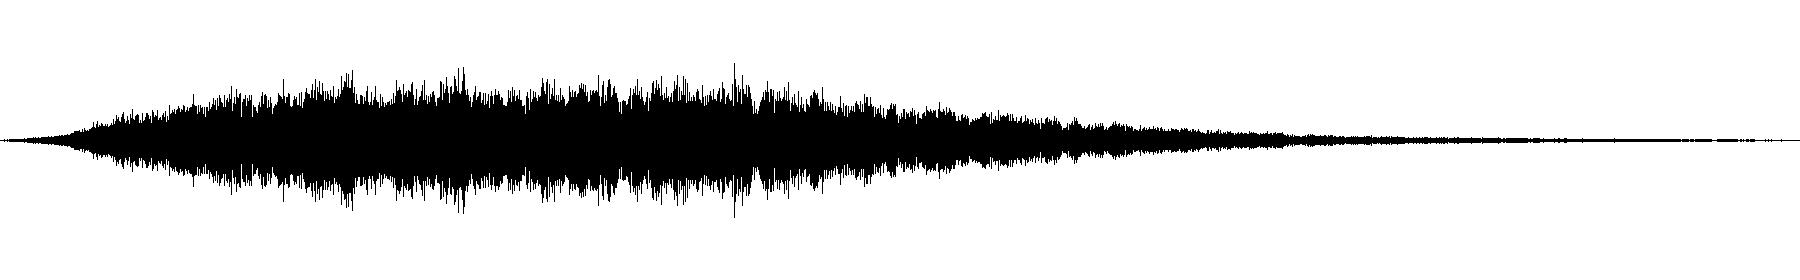 synth choir dm7